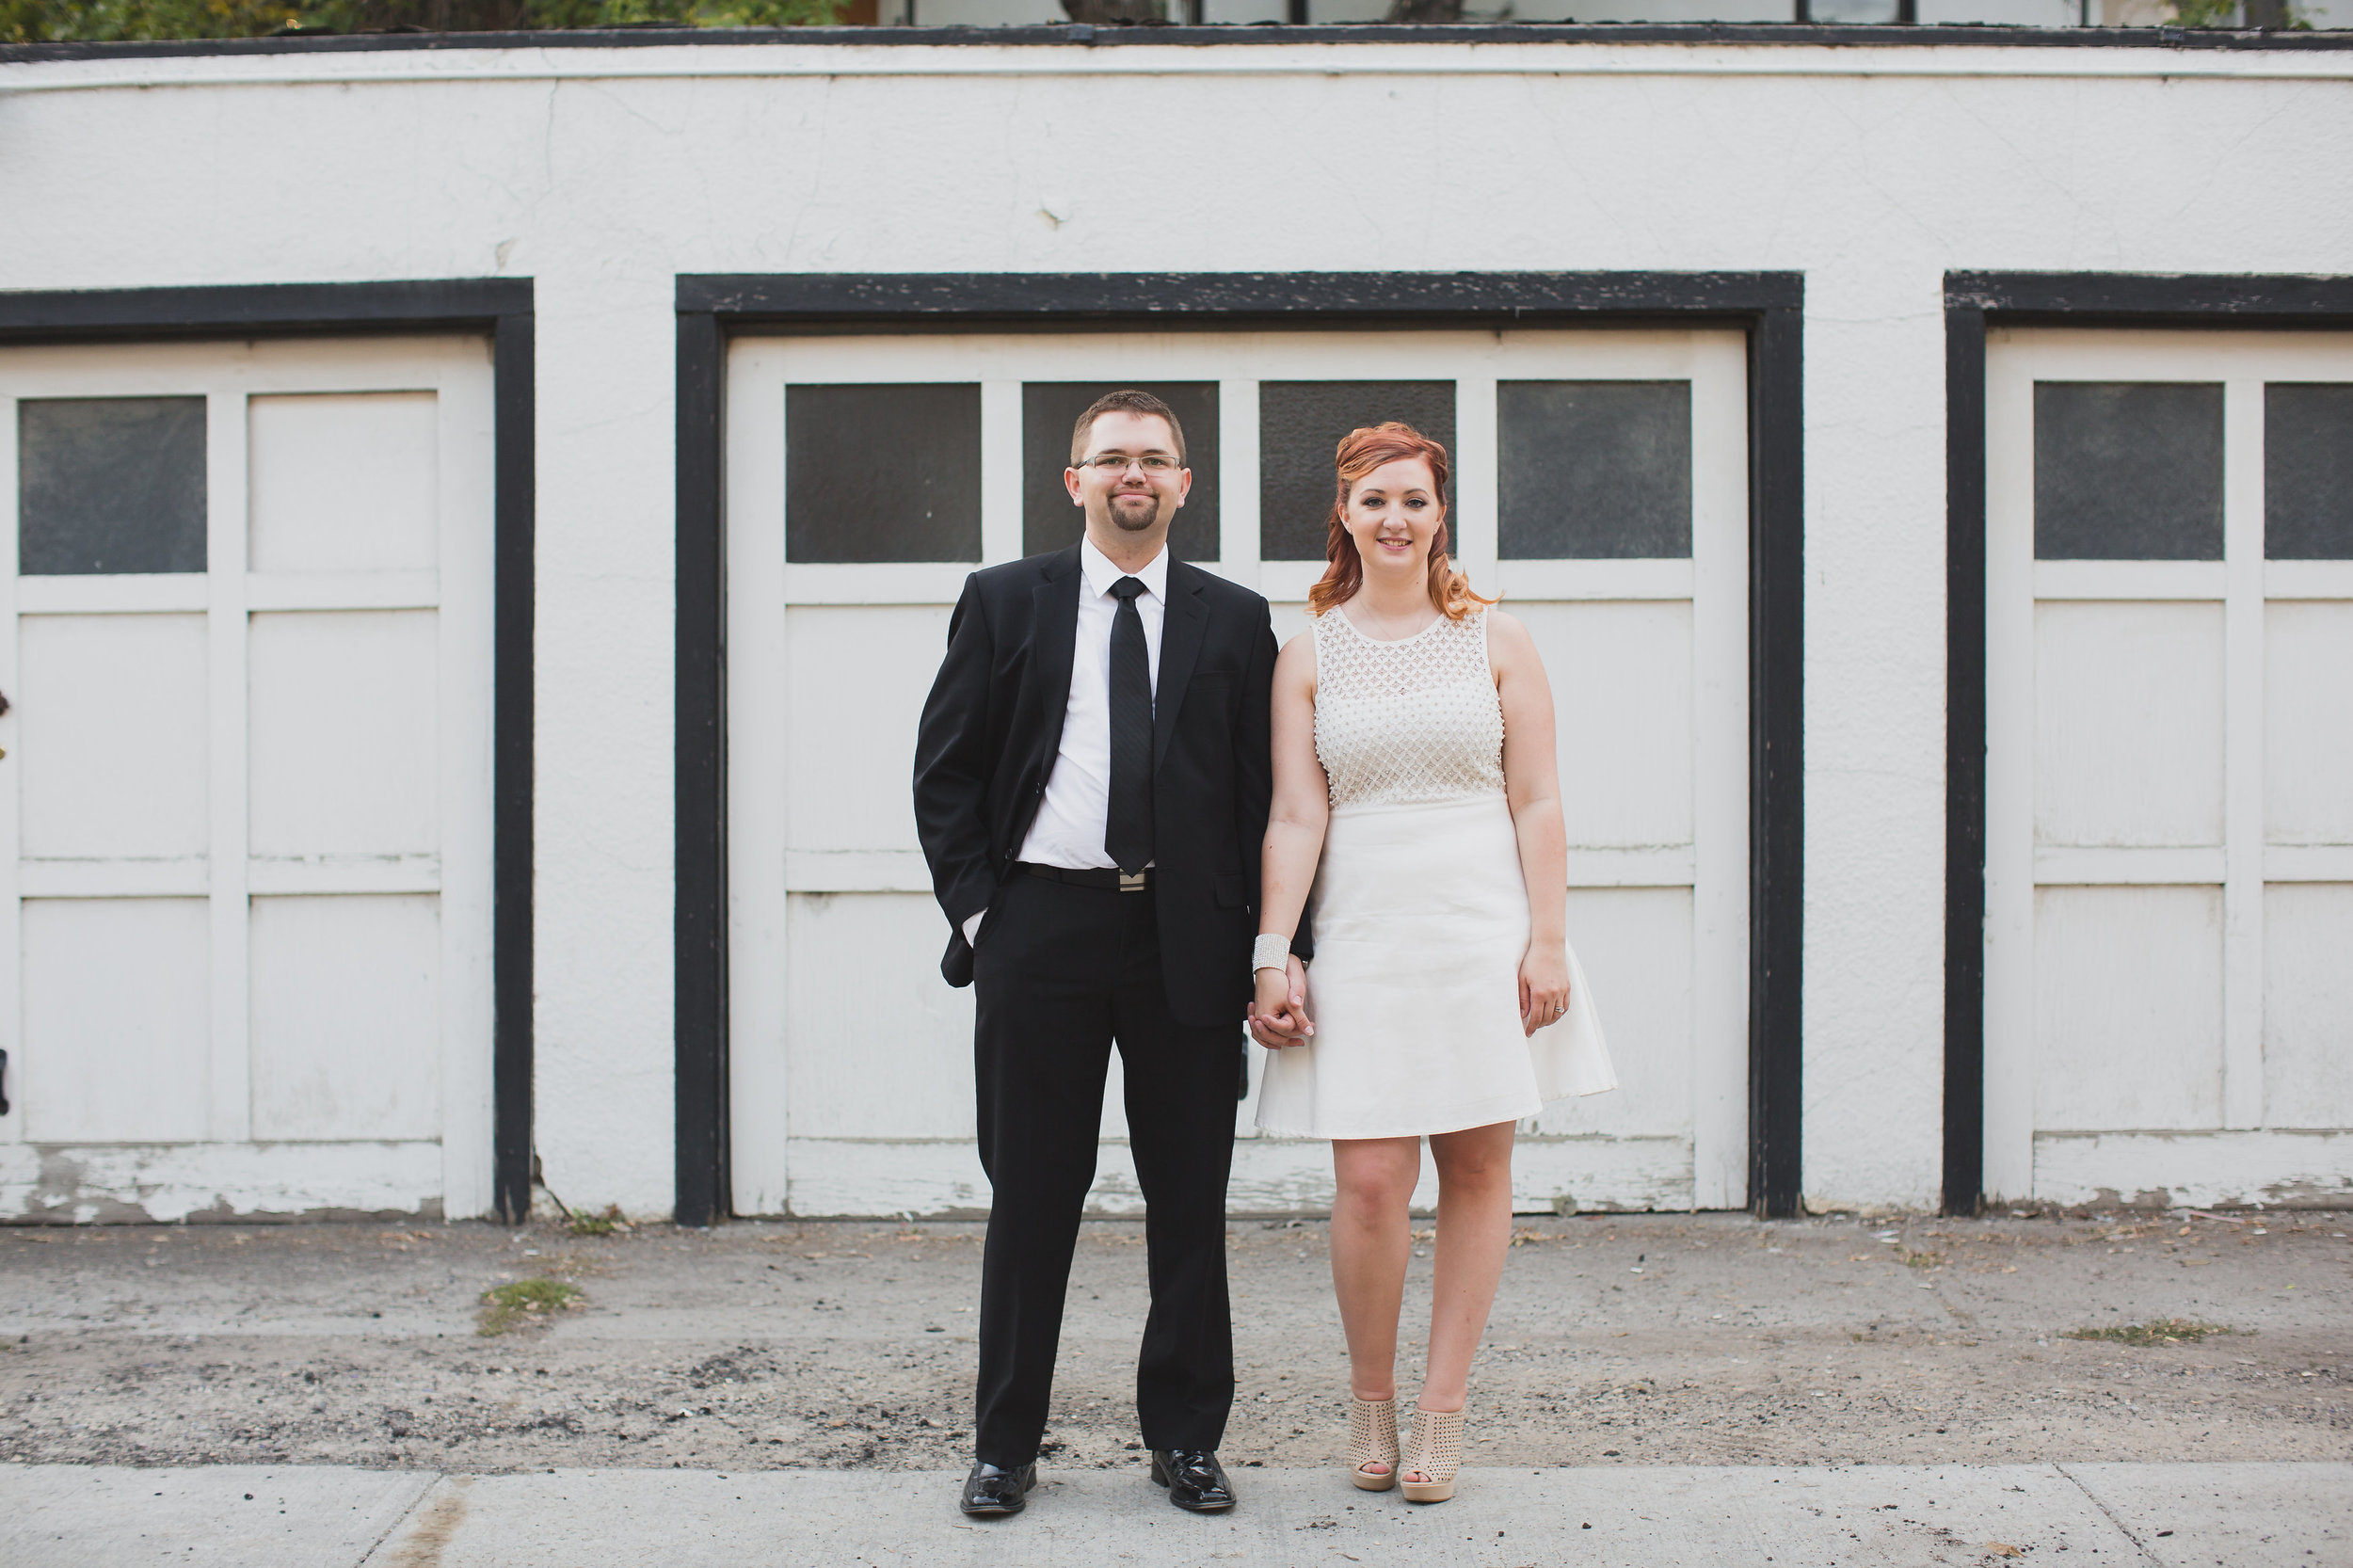 Engagement Photos 2014